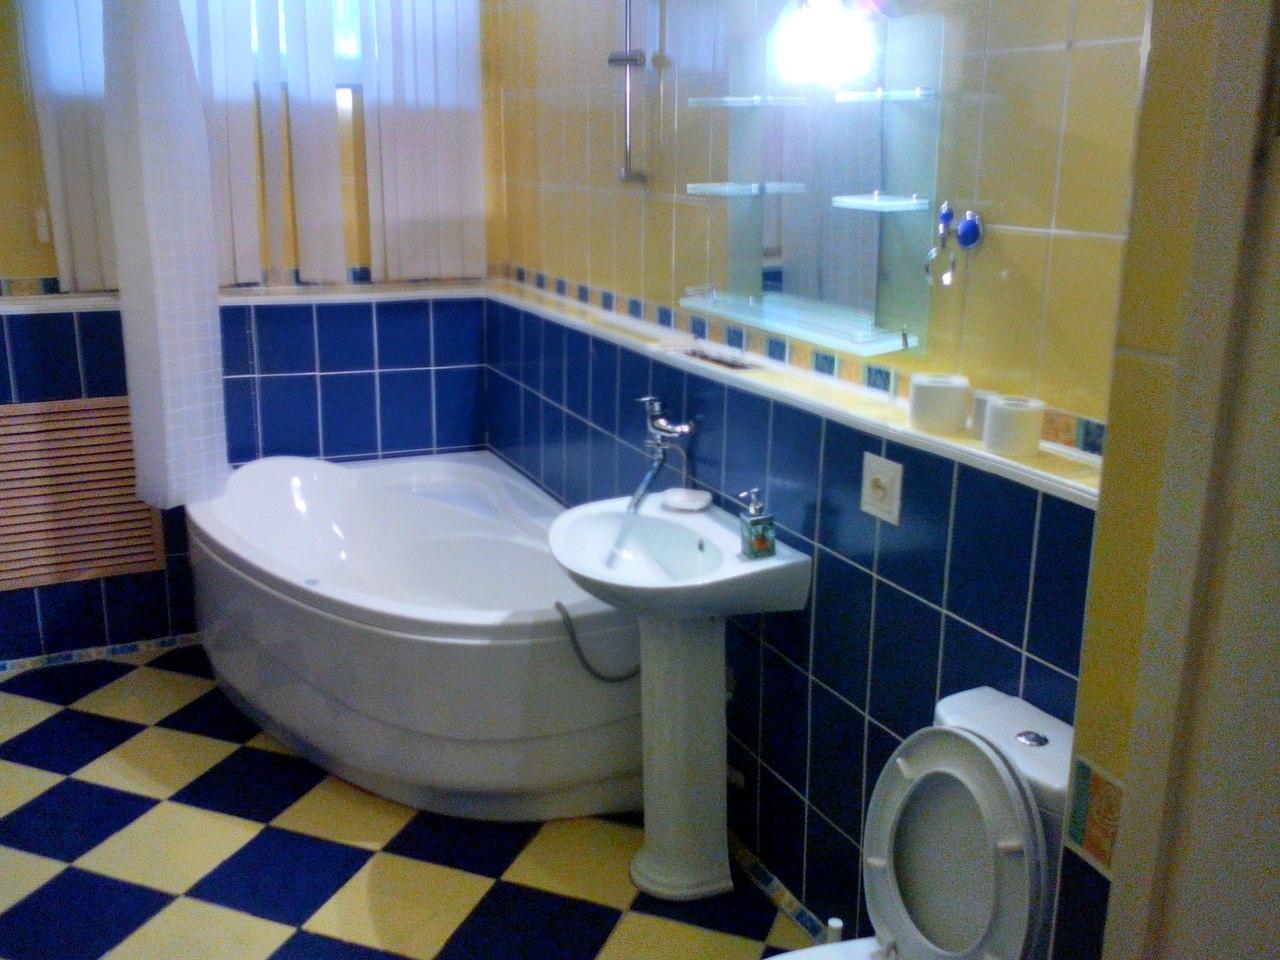 Дом отдыха «Берсут» Республика Татарстан Коттедж, фото 8